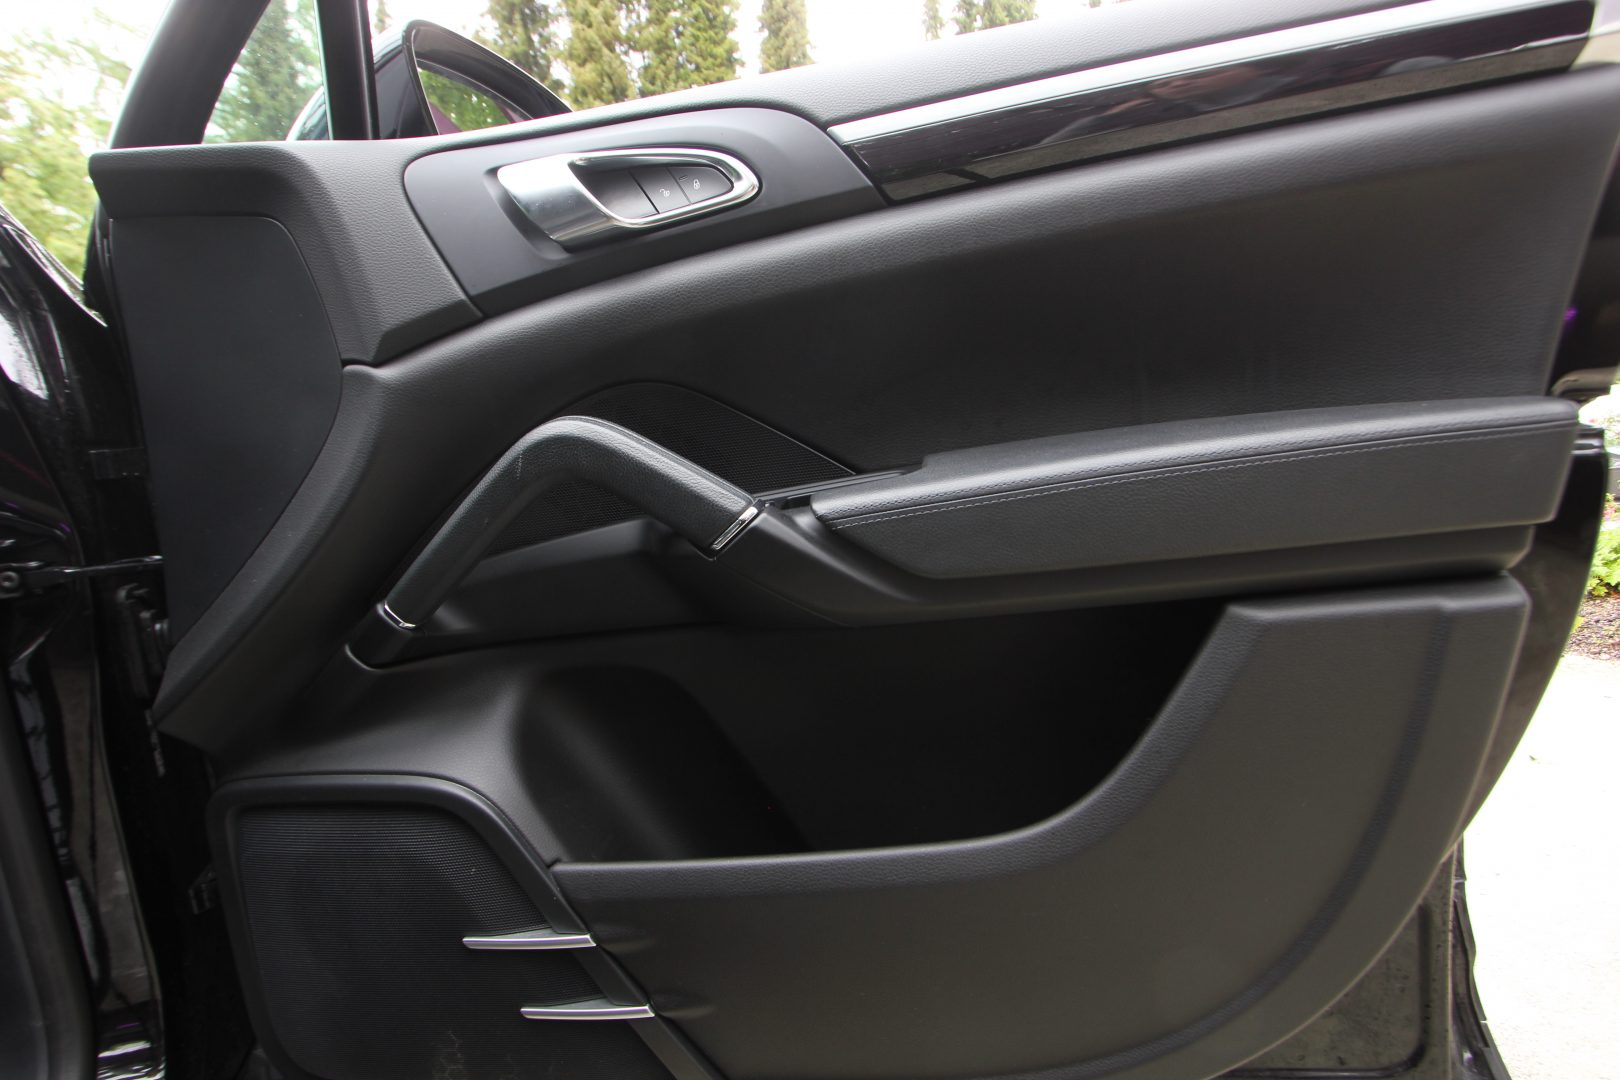 AIL Porsche Cayenne Panorama 21 Zoll  11